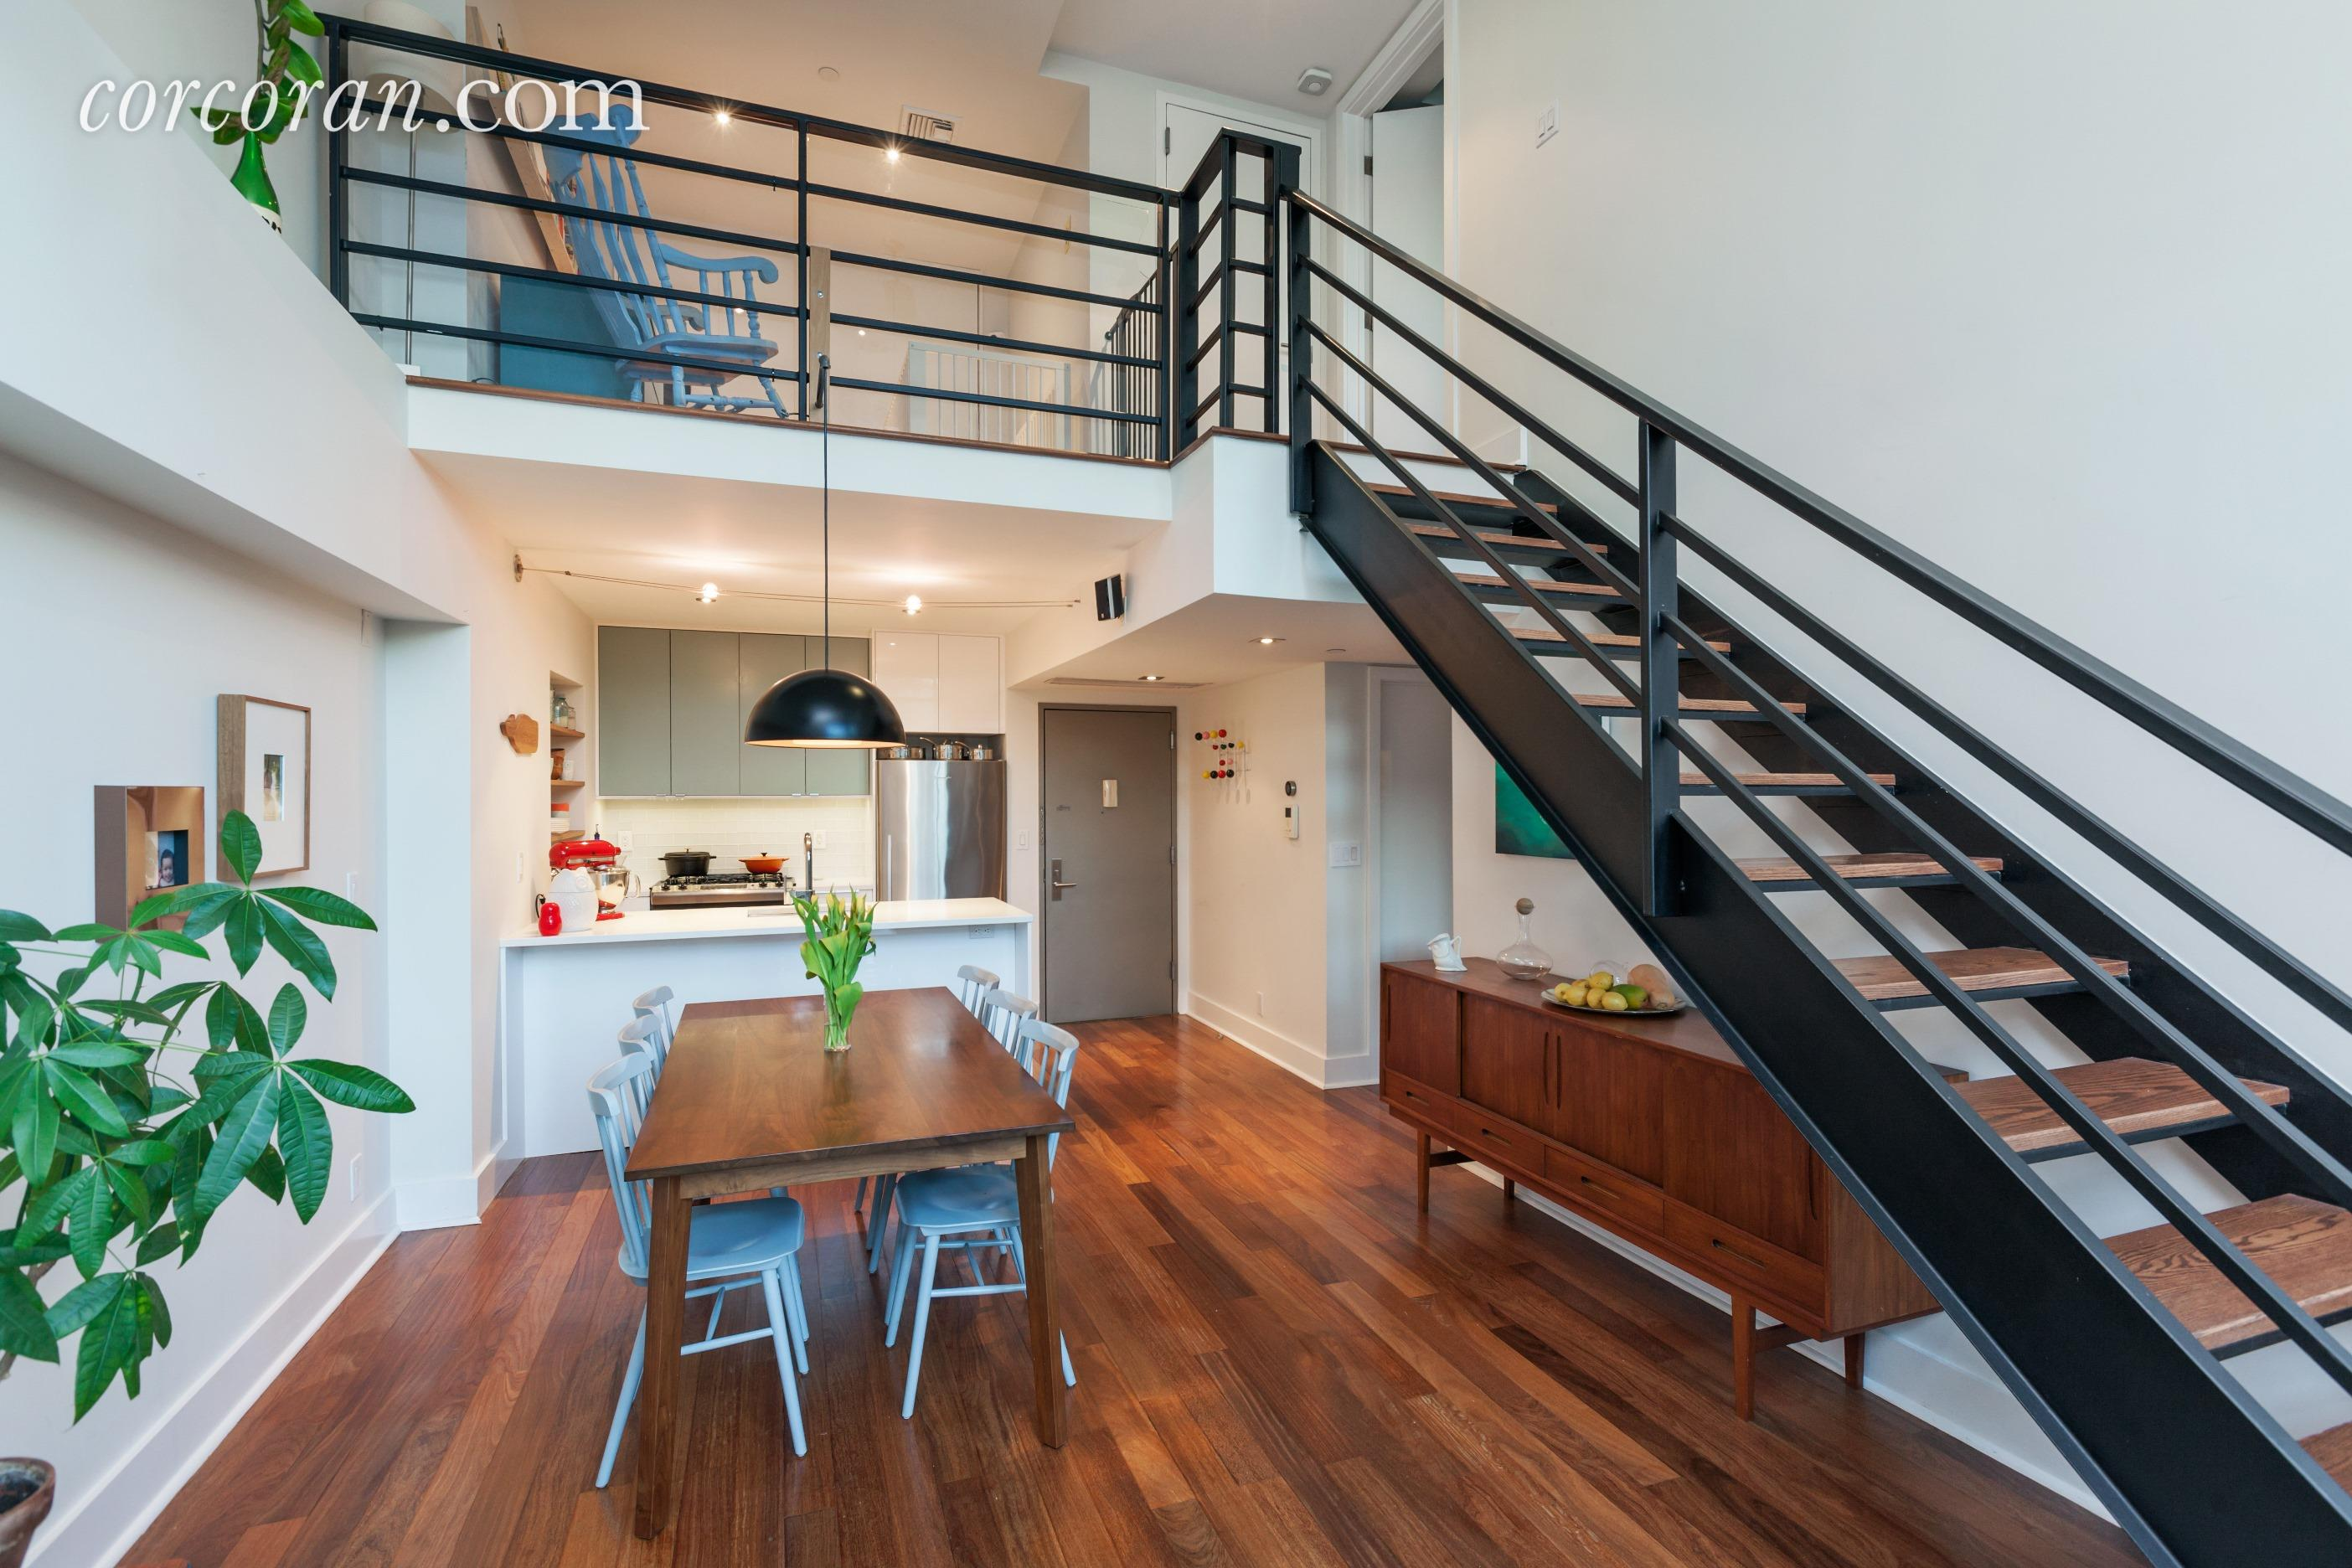 149 Huron Street, living room, duplex, condo, greenpoint